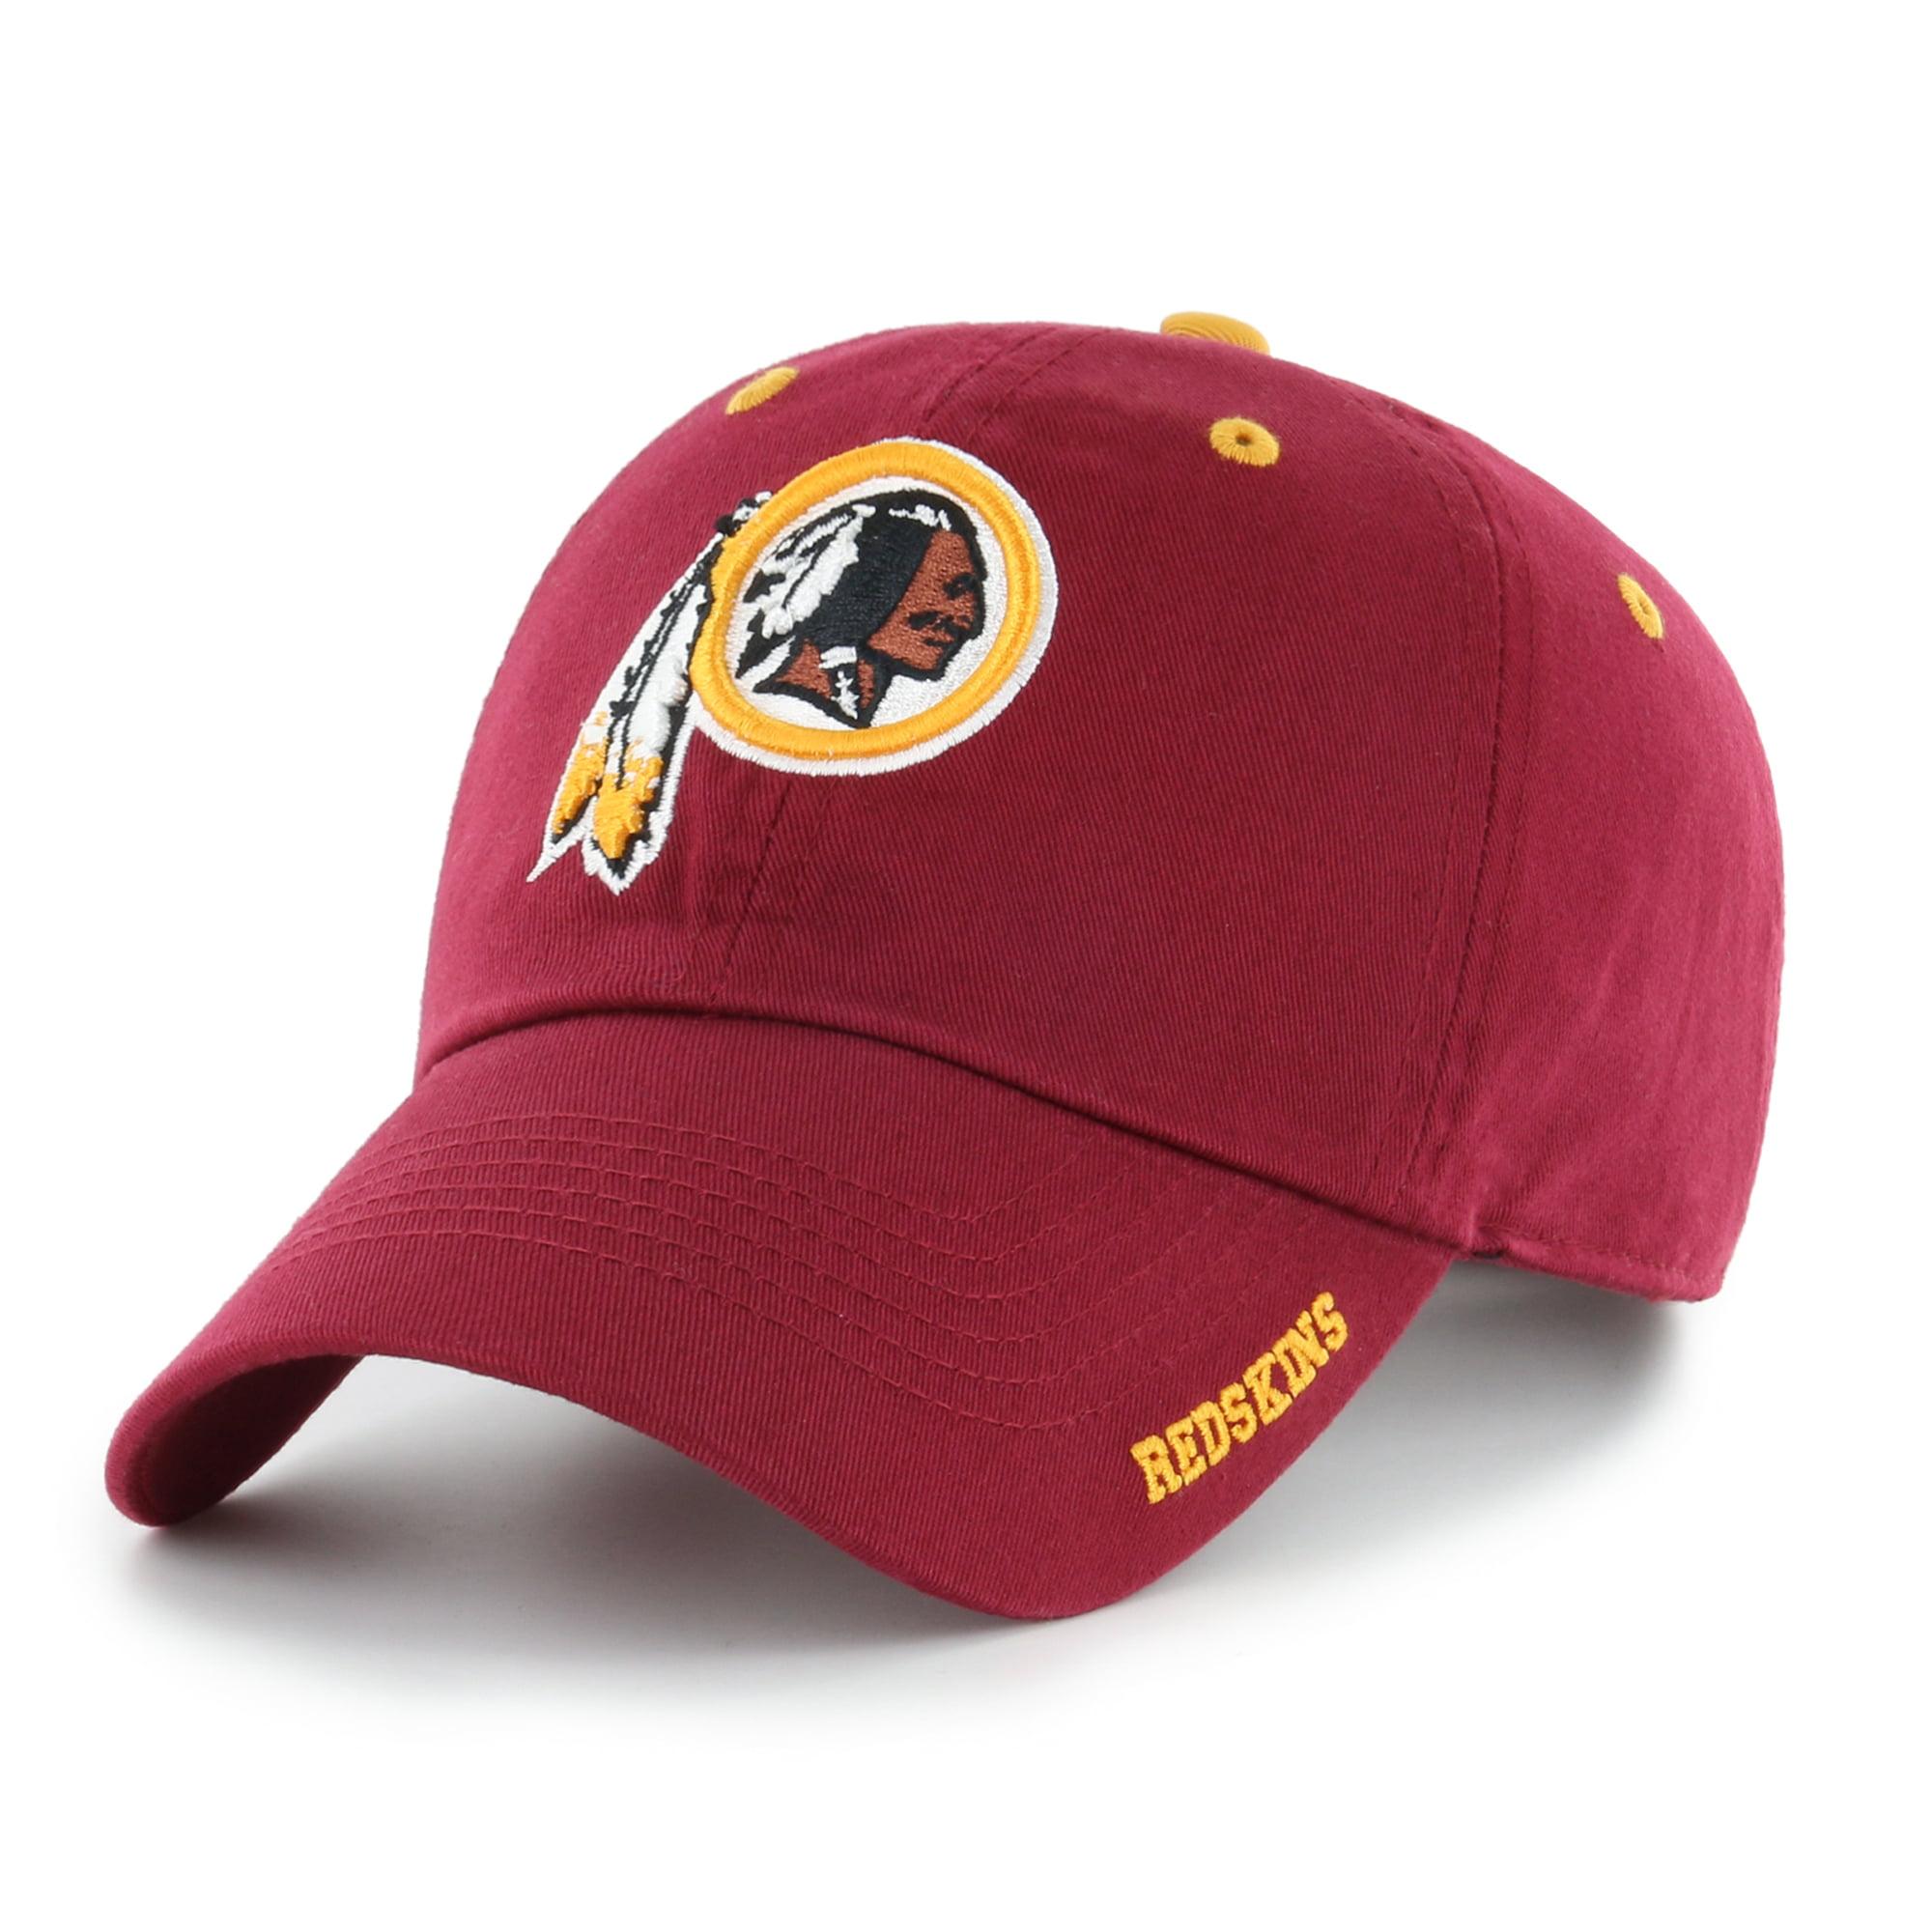 13eb227d Washington Redskins Team Shop - Walmart.com